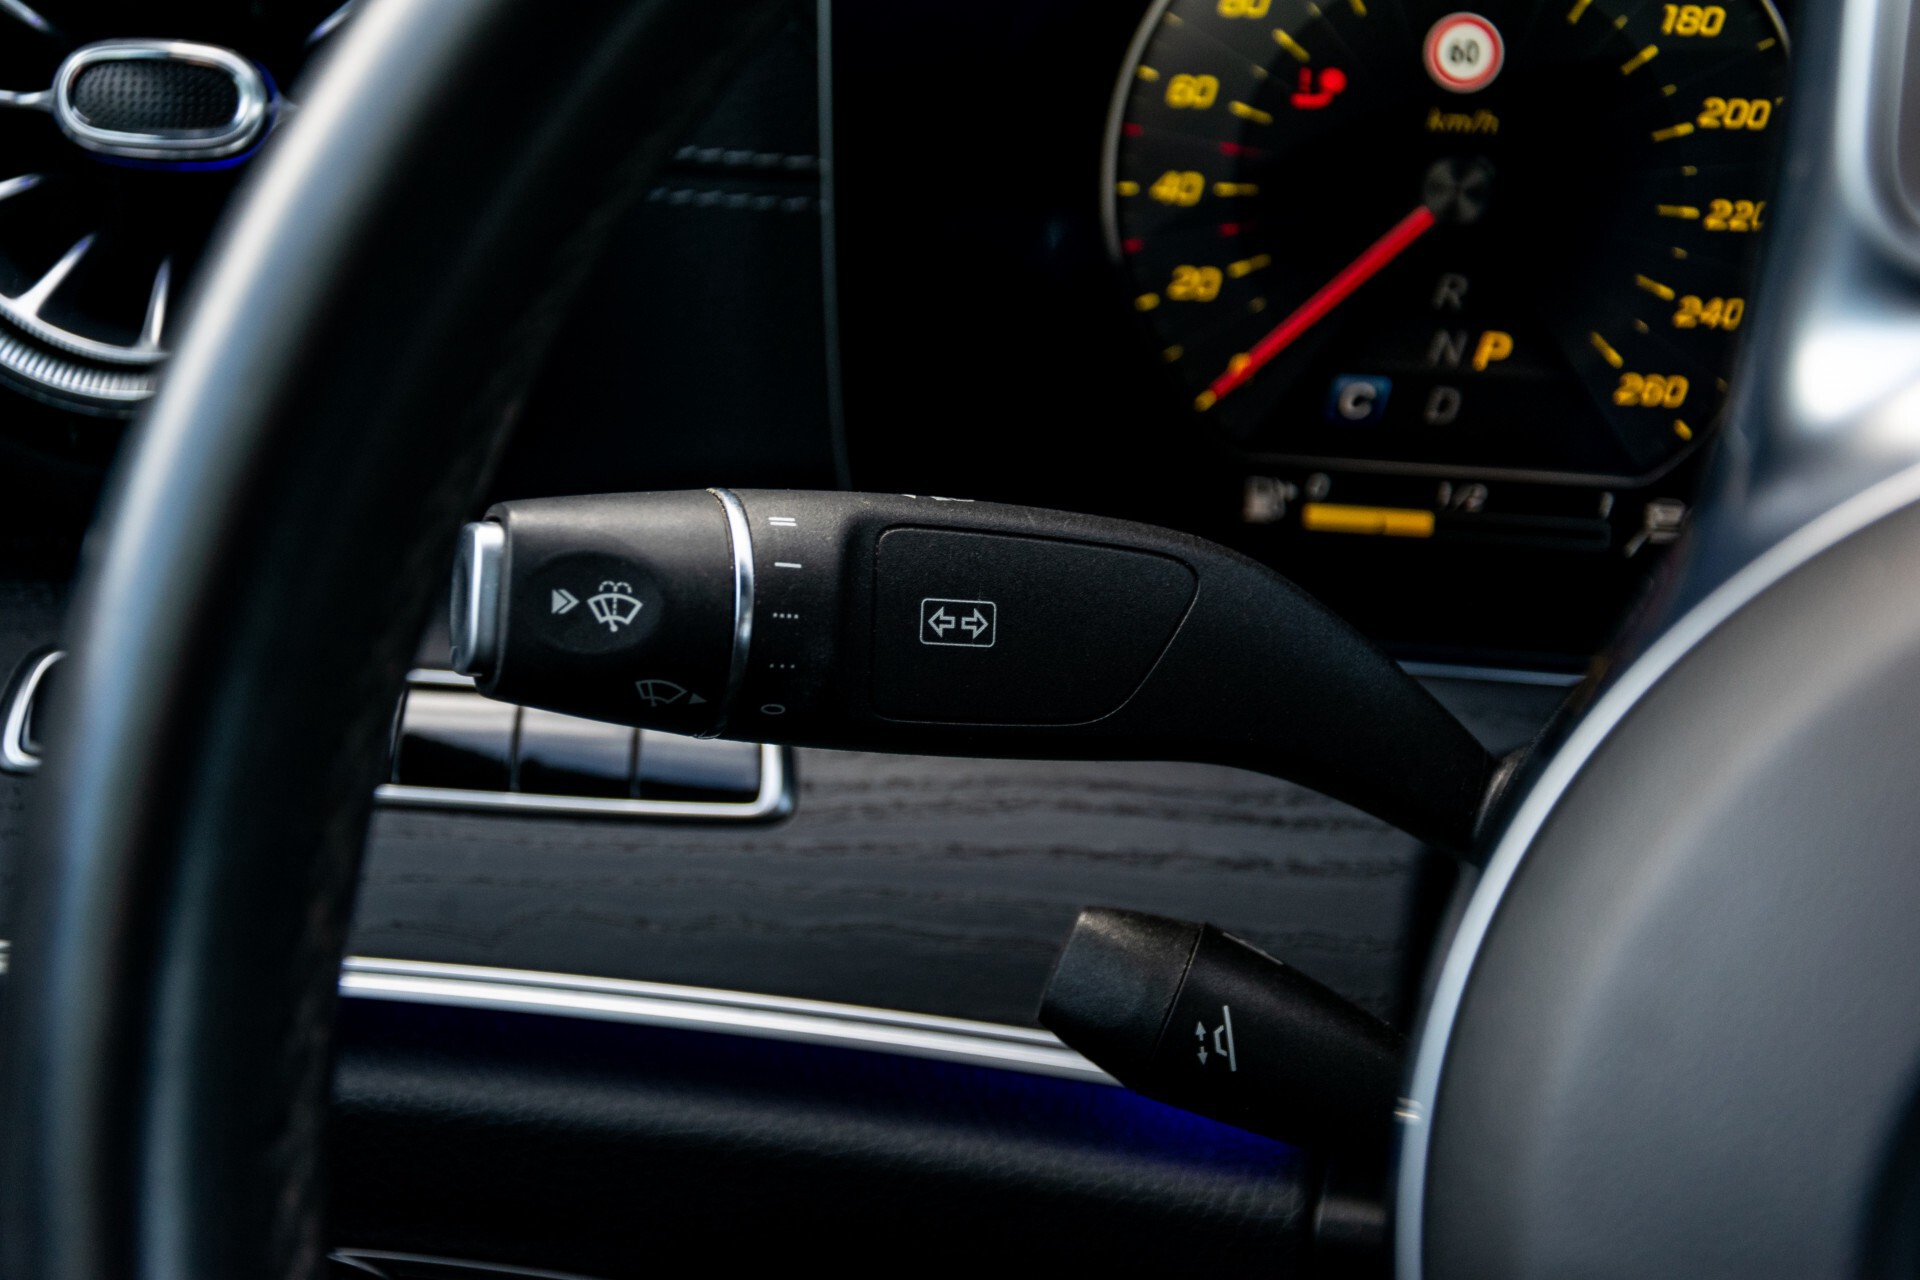 Mercedes-Benz E-Klasse Coupé 300 AMG Panorama/Rij-assist/Keyless/Massage/Memory/HUD/Standkachel/Night Aut9 Foto 11